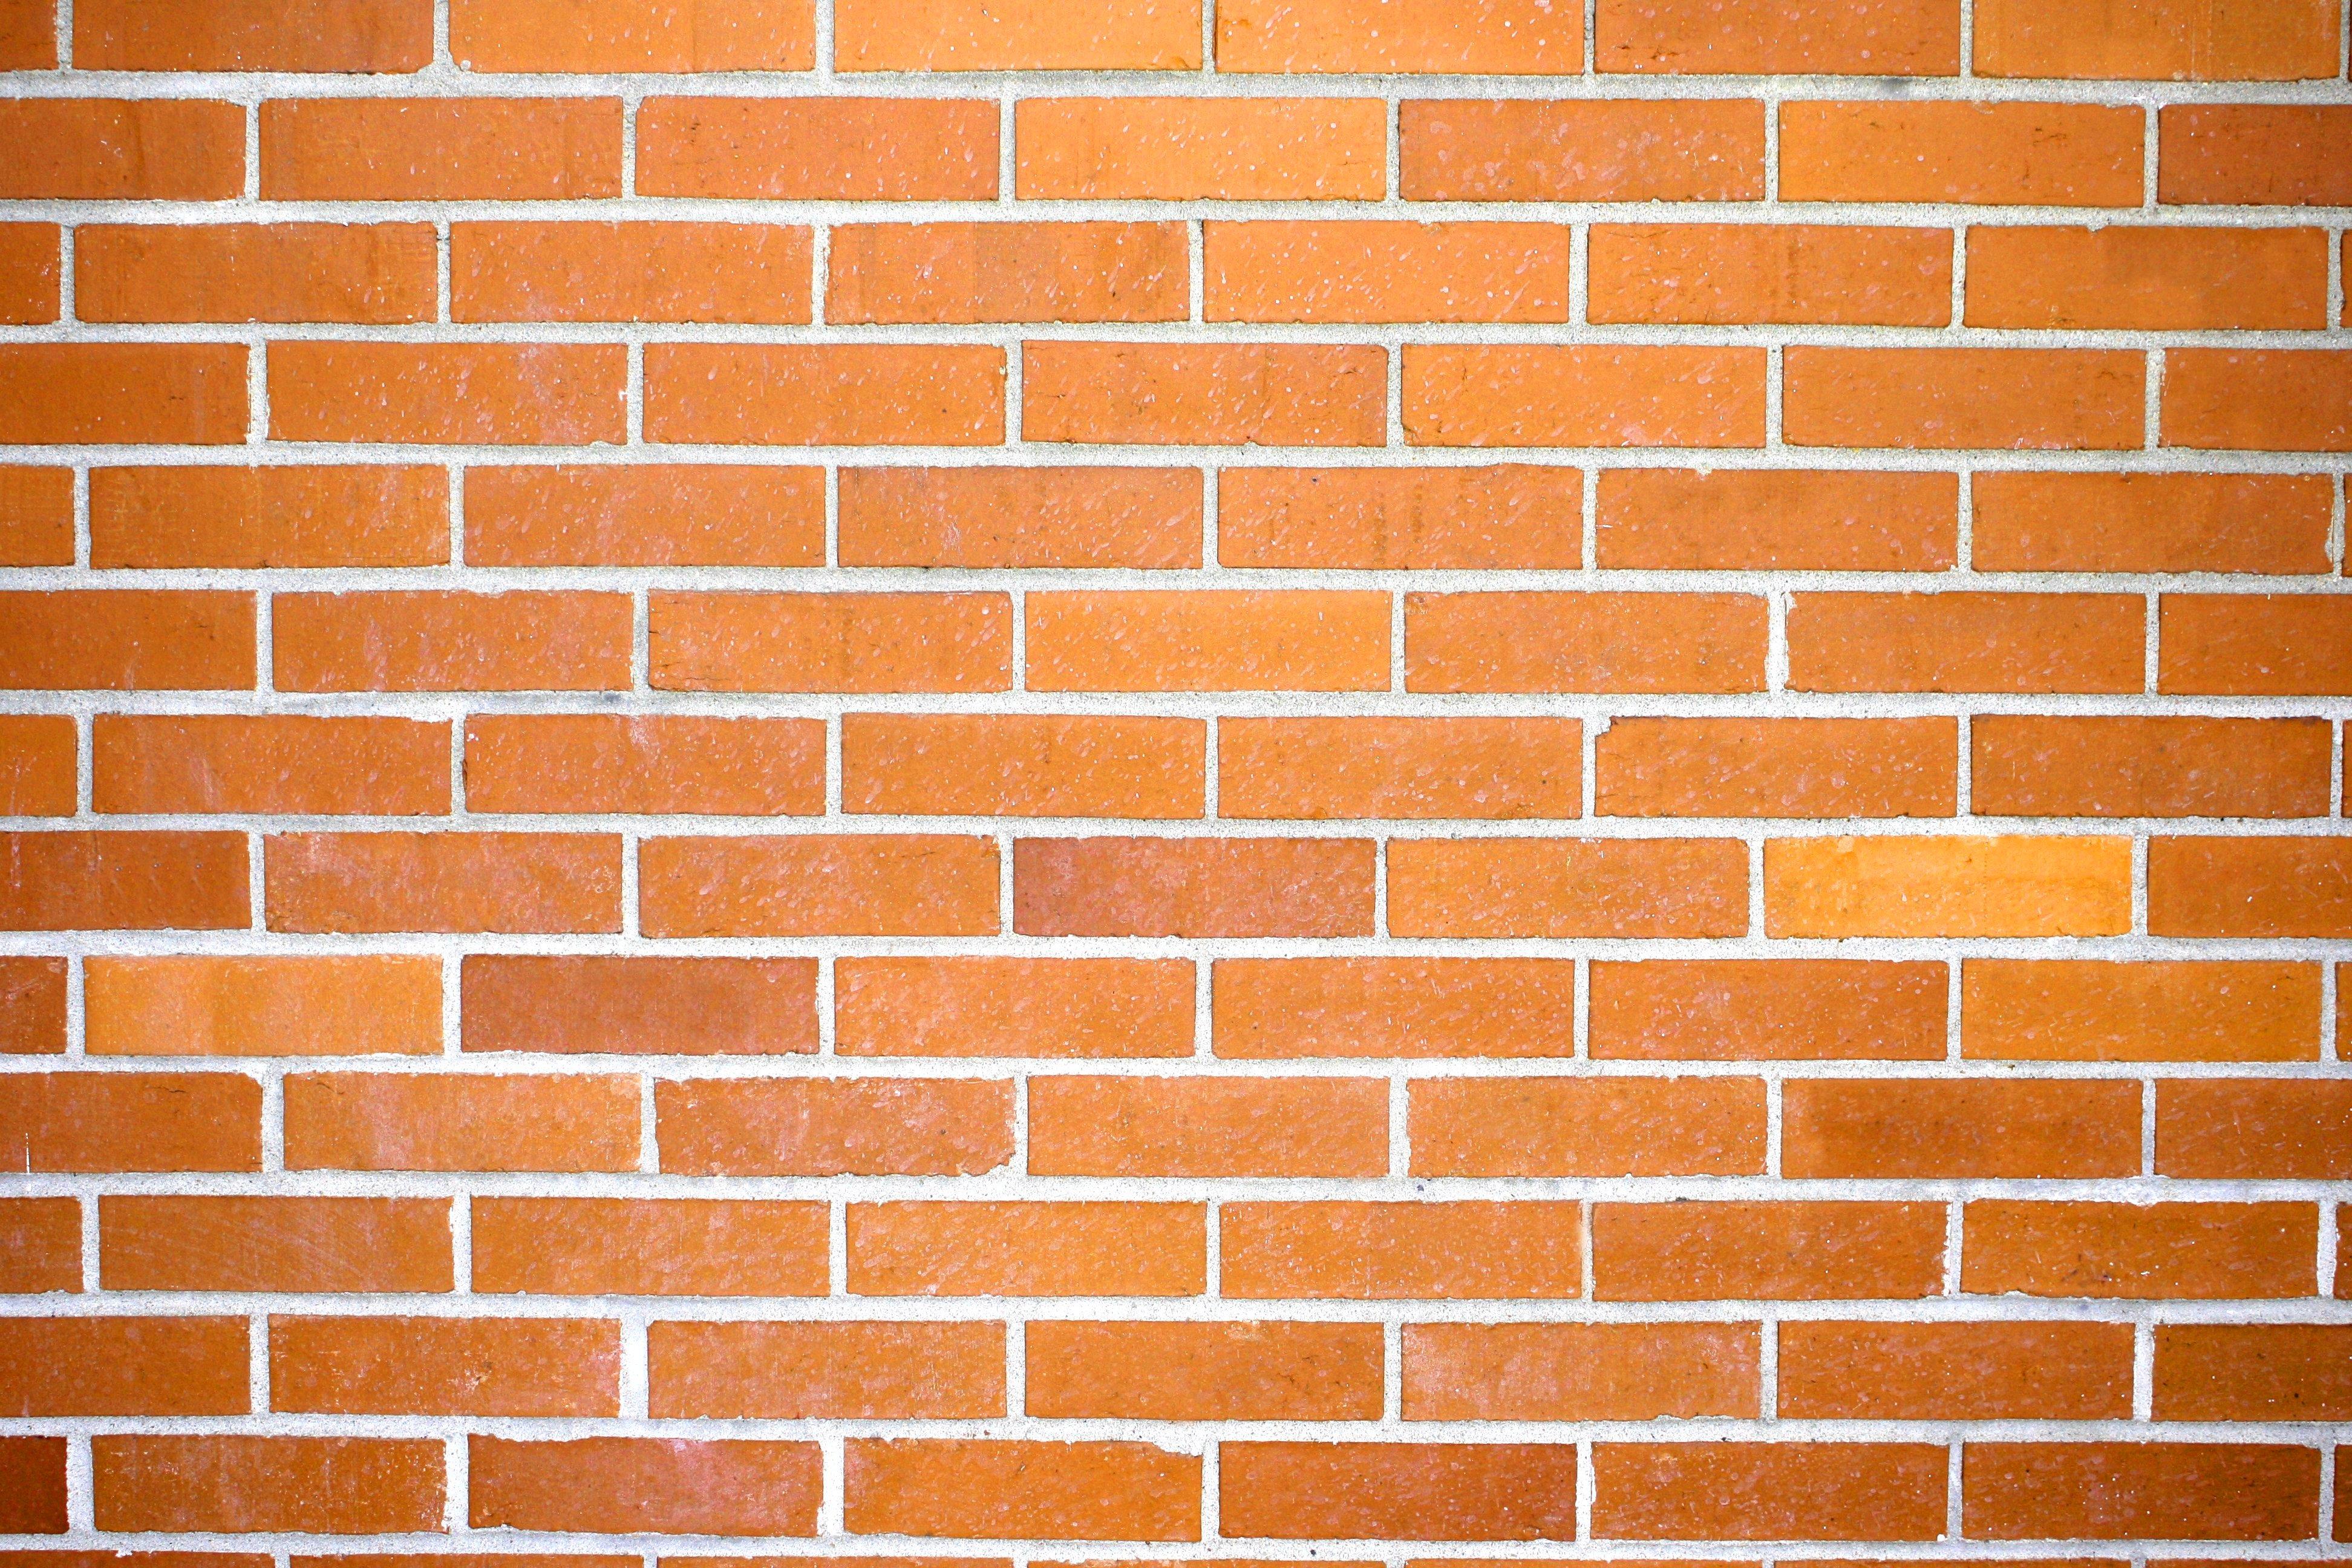 Orange Brick Wall Texture Picture | Free Photograph | Photos Public ...